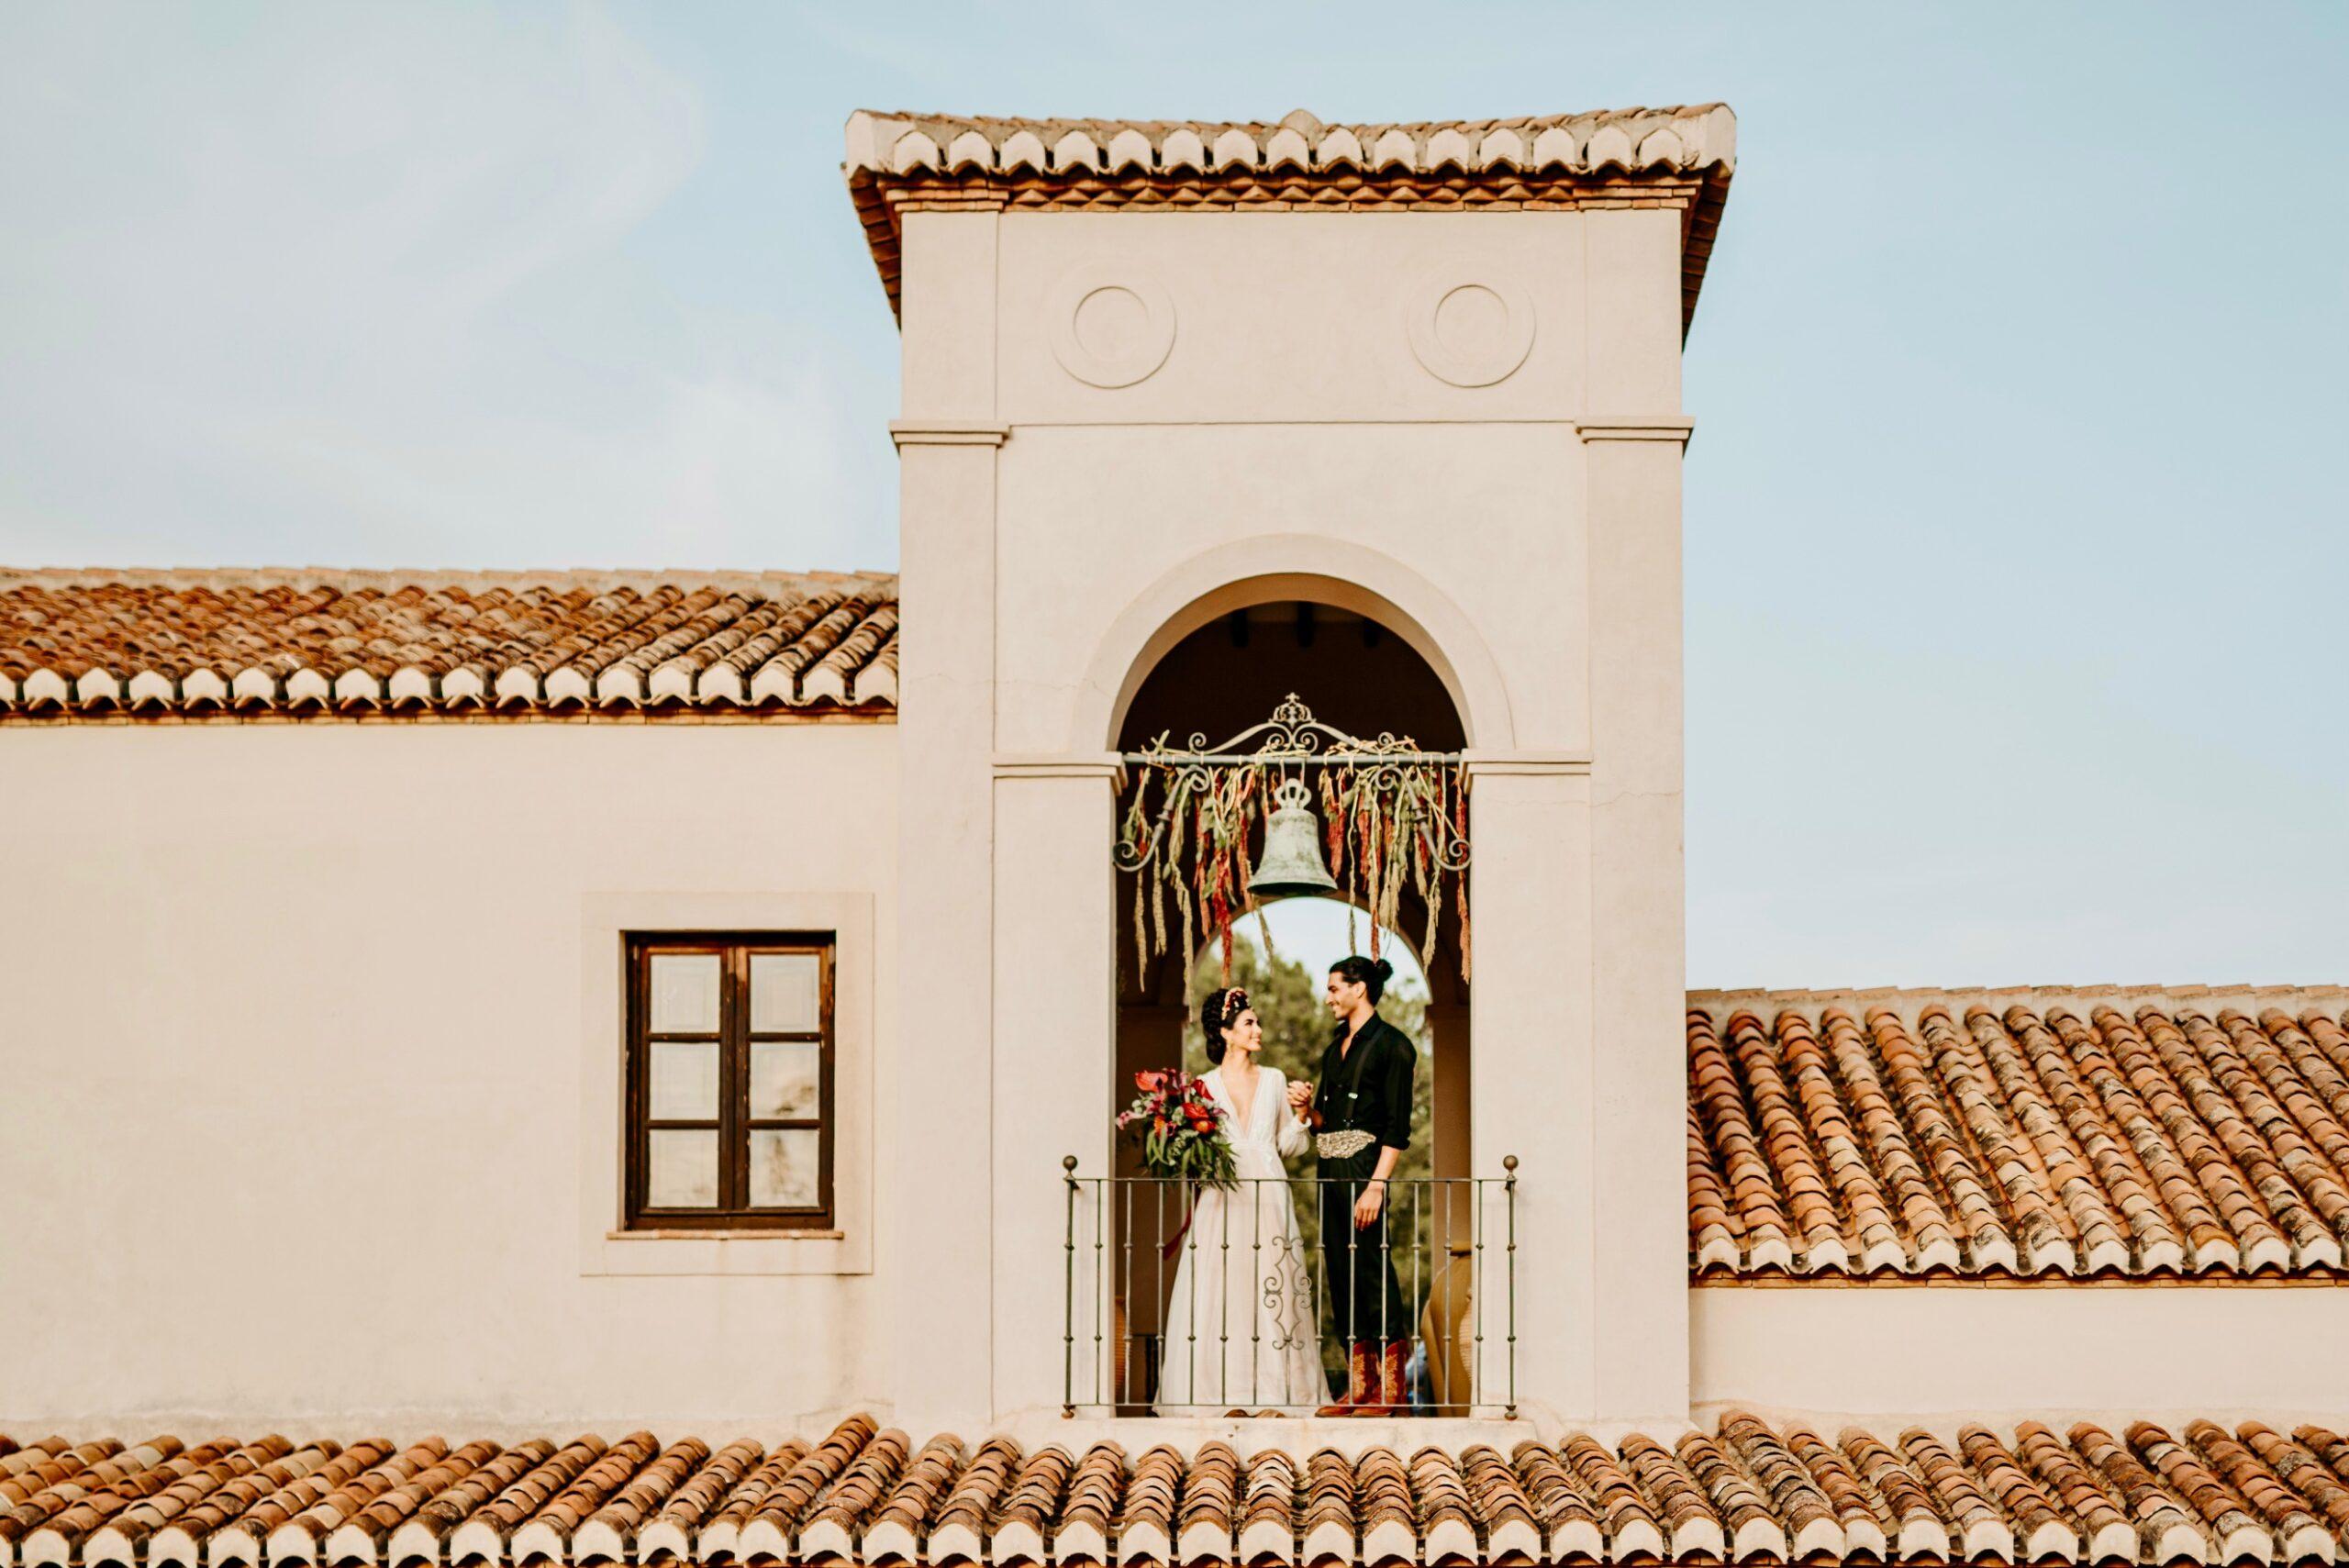 La Esperanza Granada, the most romantic hacienda wedding venue in Spain